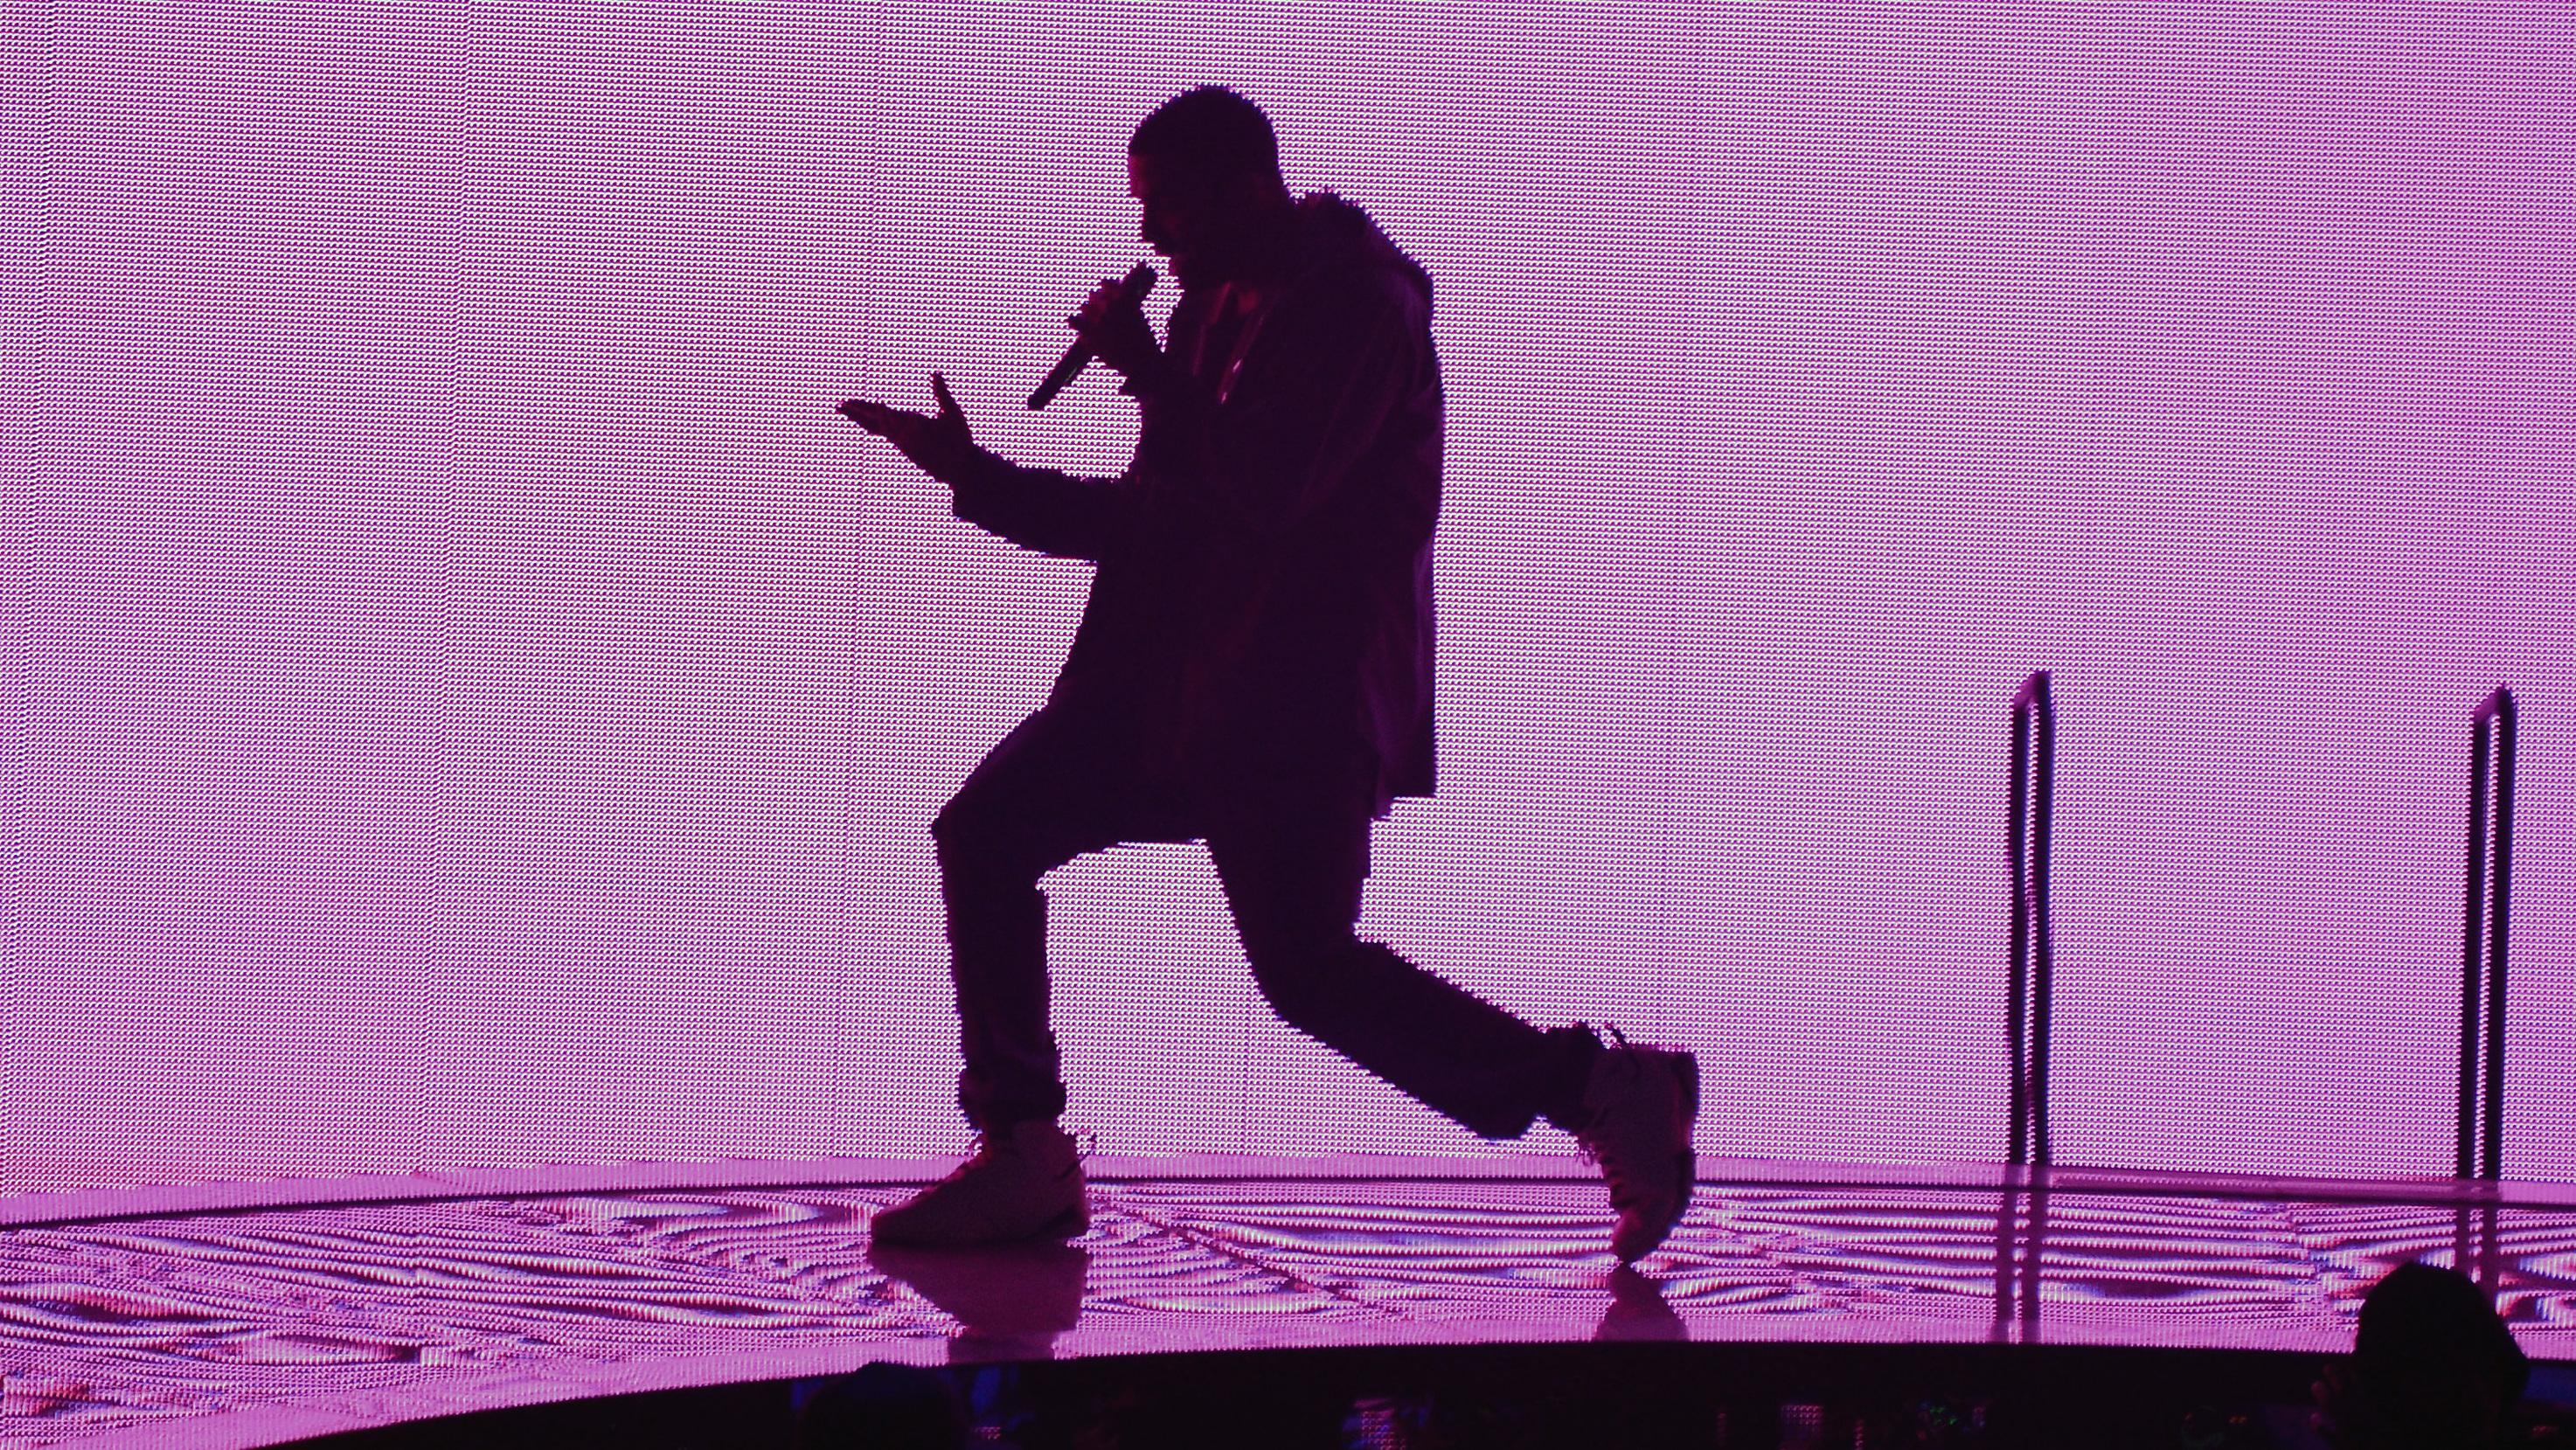 Where Rock The Bells Fails, Drake's Tour Succeeds